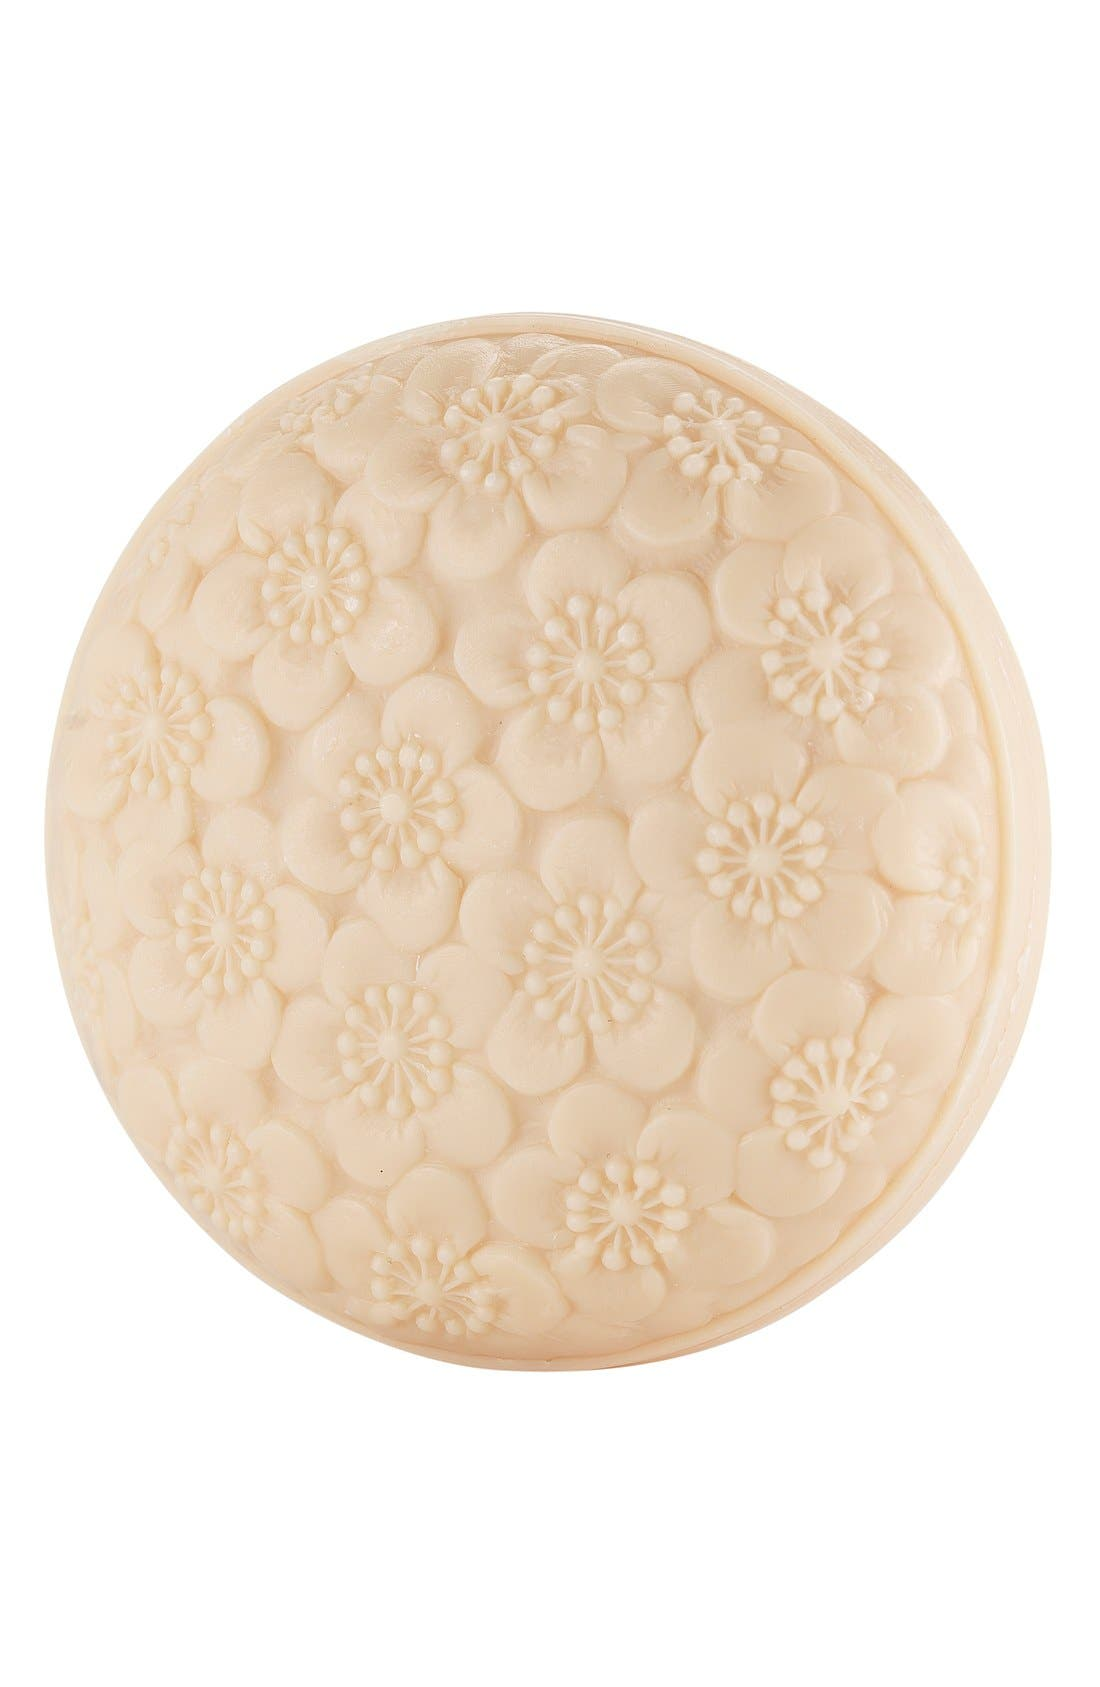 'Spring Flower' Soap,                             Alternate thumbnail 2, color,                             NO COLOR